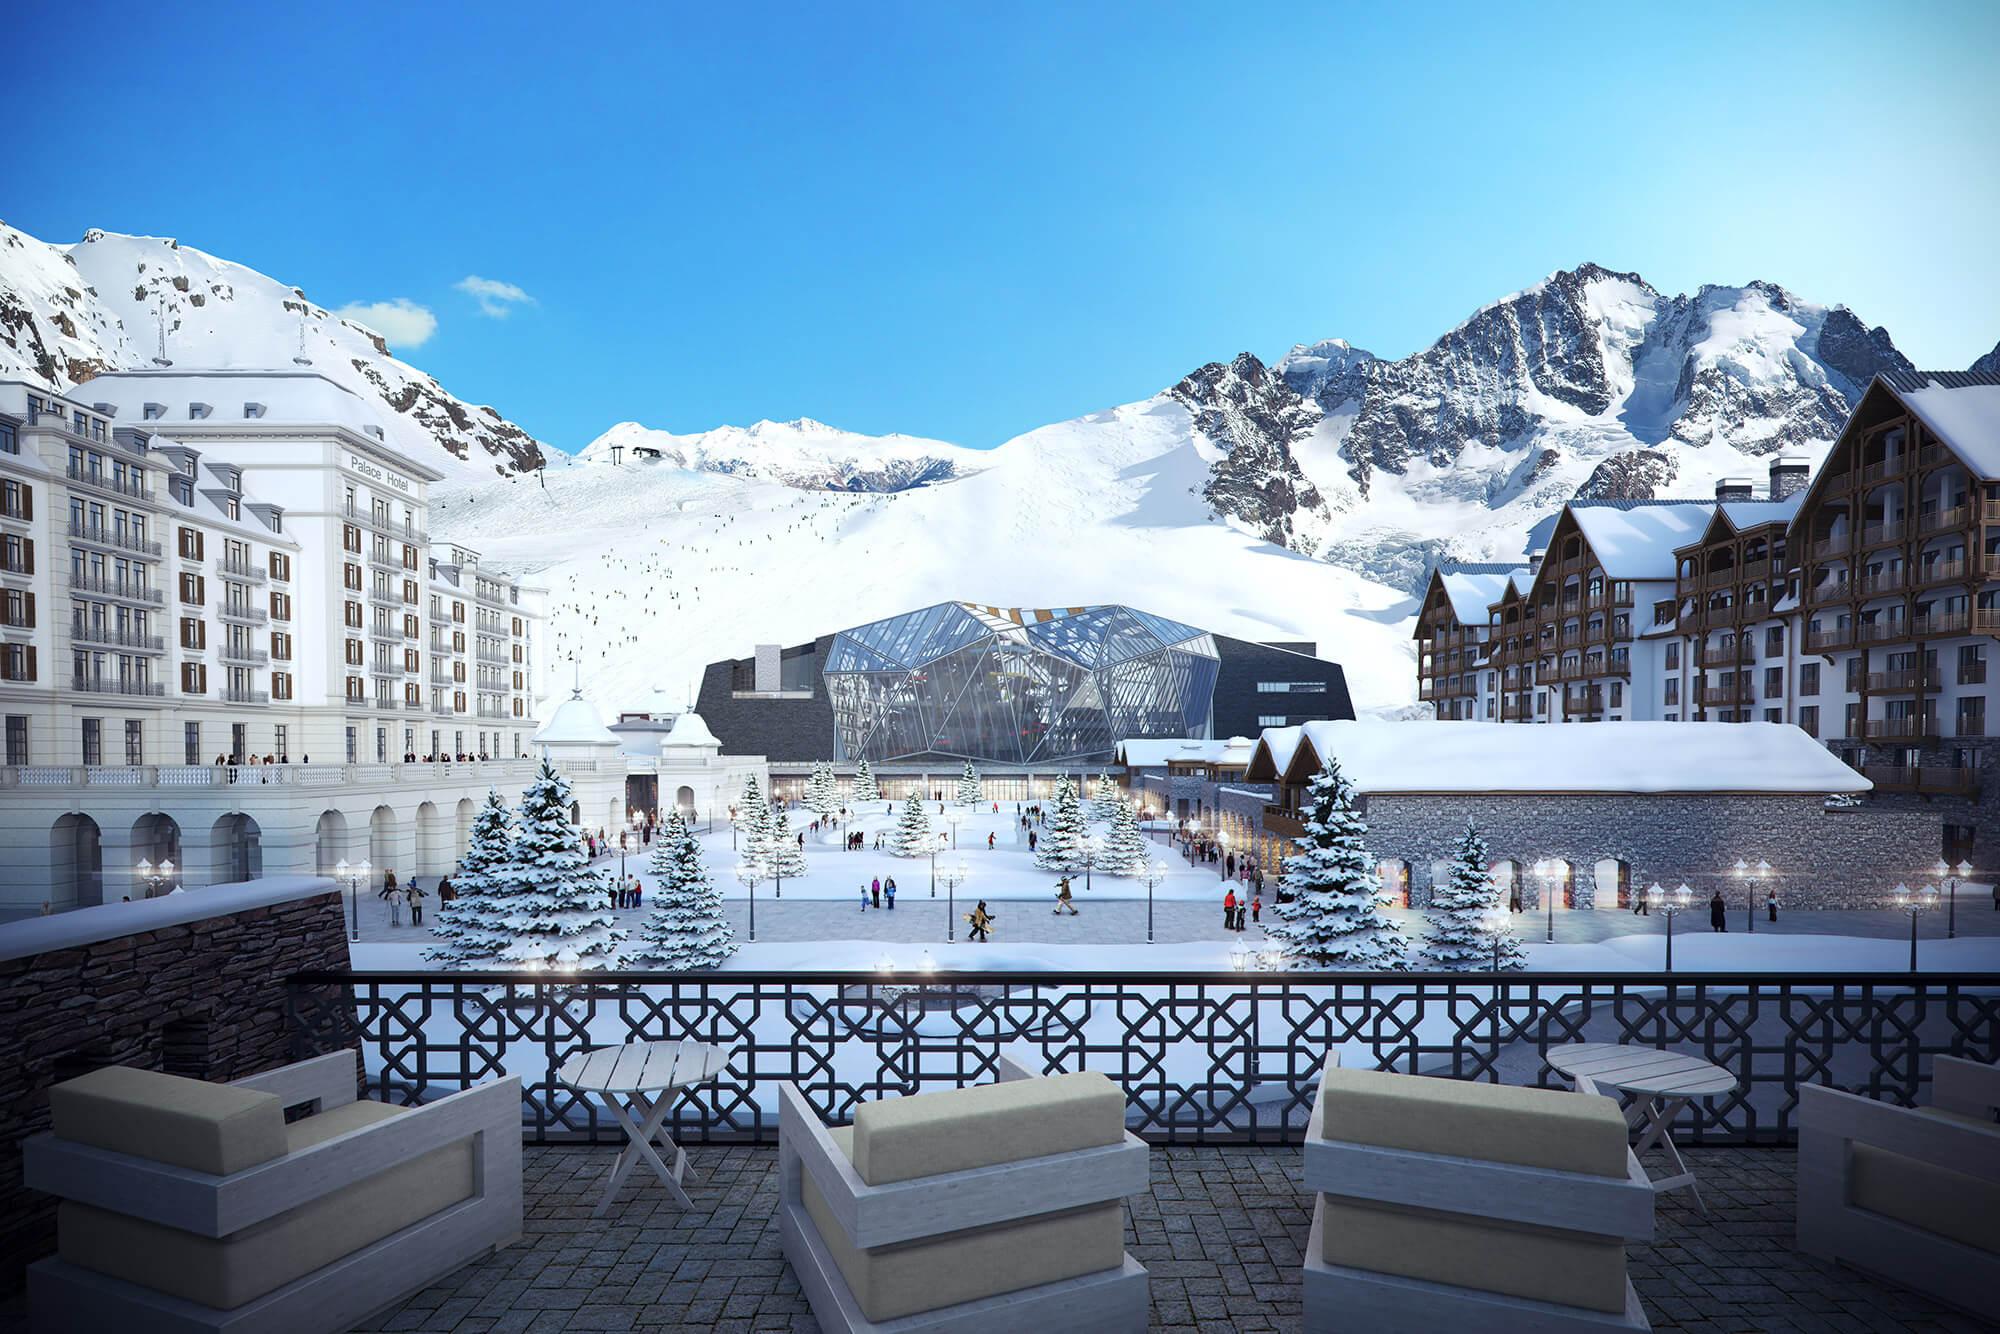 ski resort - azerbaijan | cgi sources international architecture